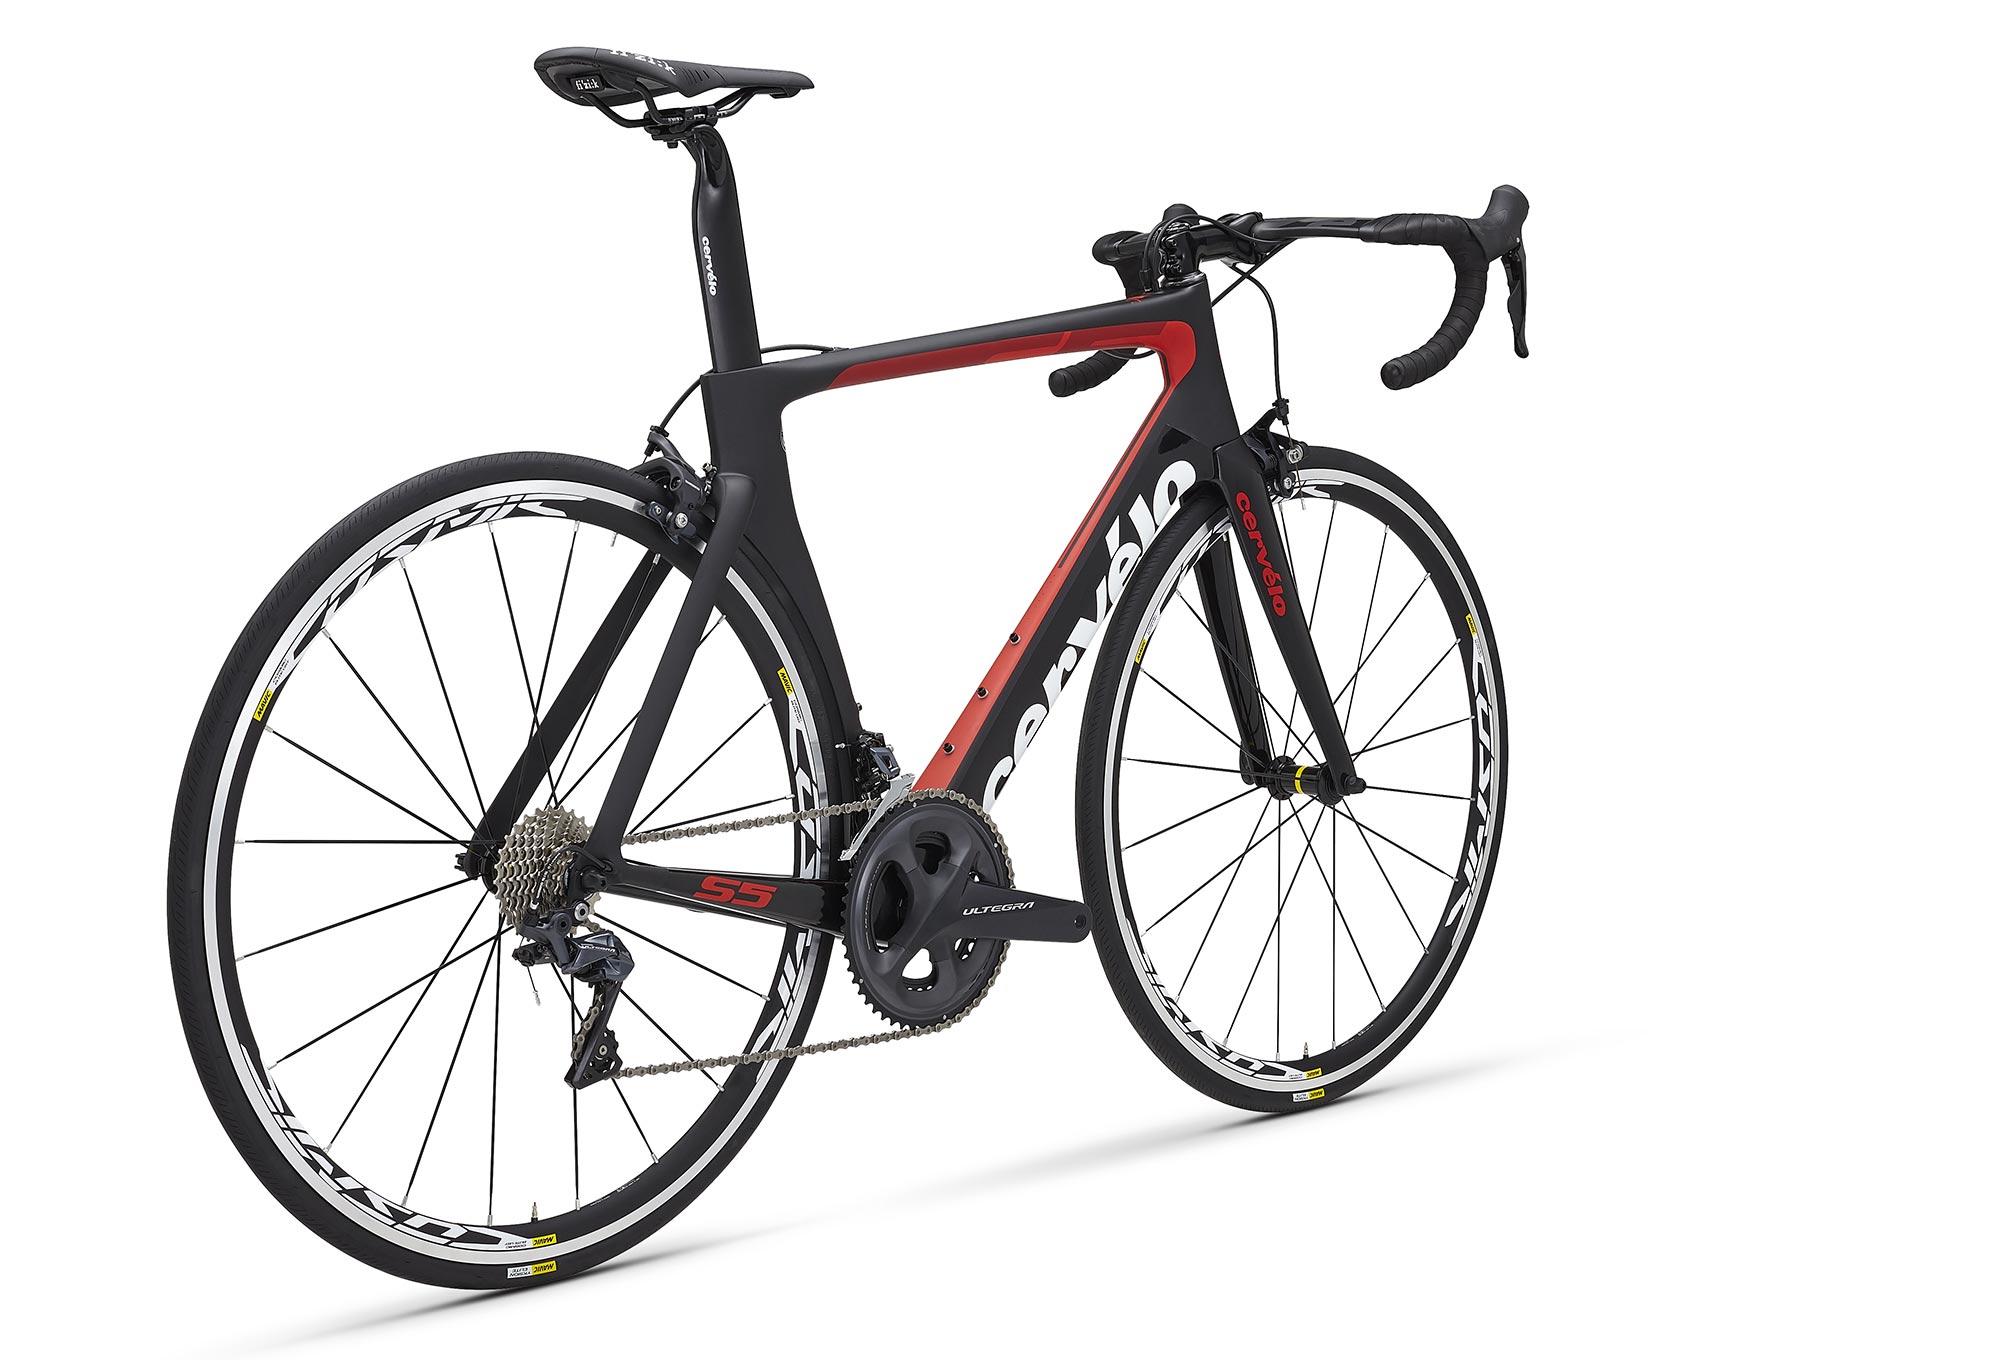 Cervélo S5 Road Bike Shimano Ultegra 8000 11S 2018 Black